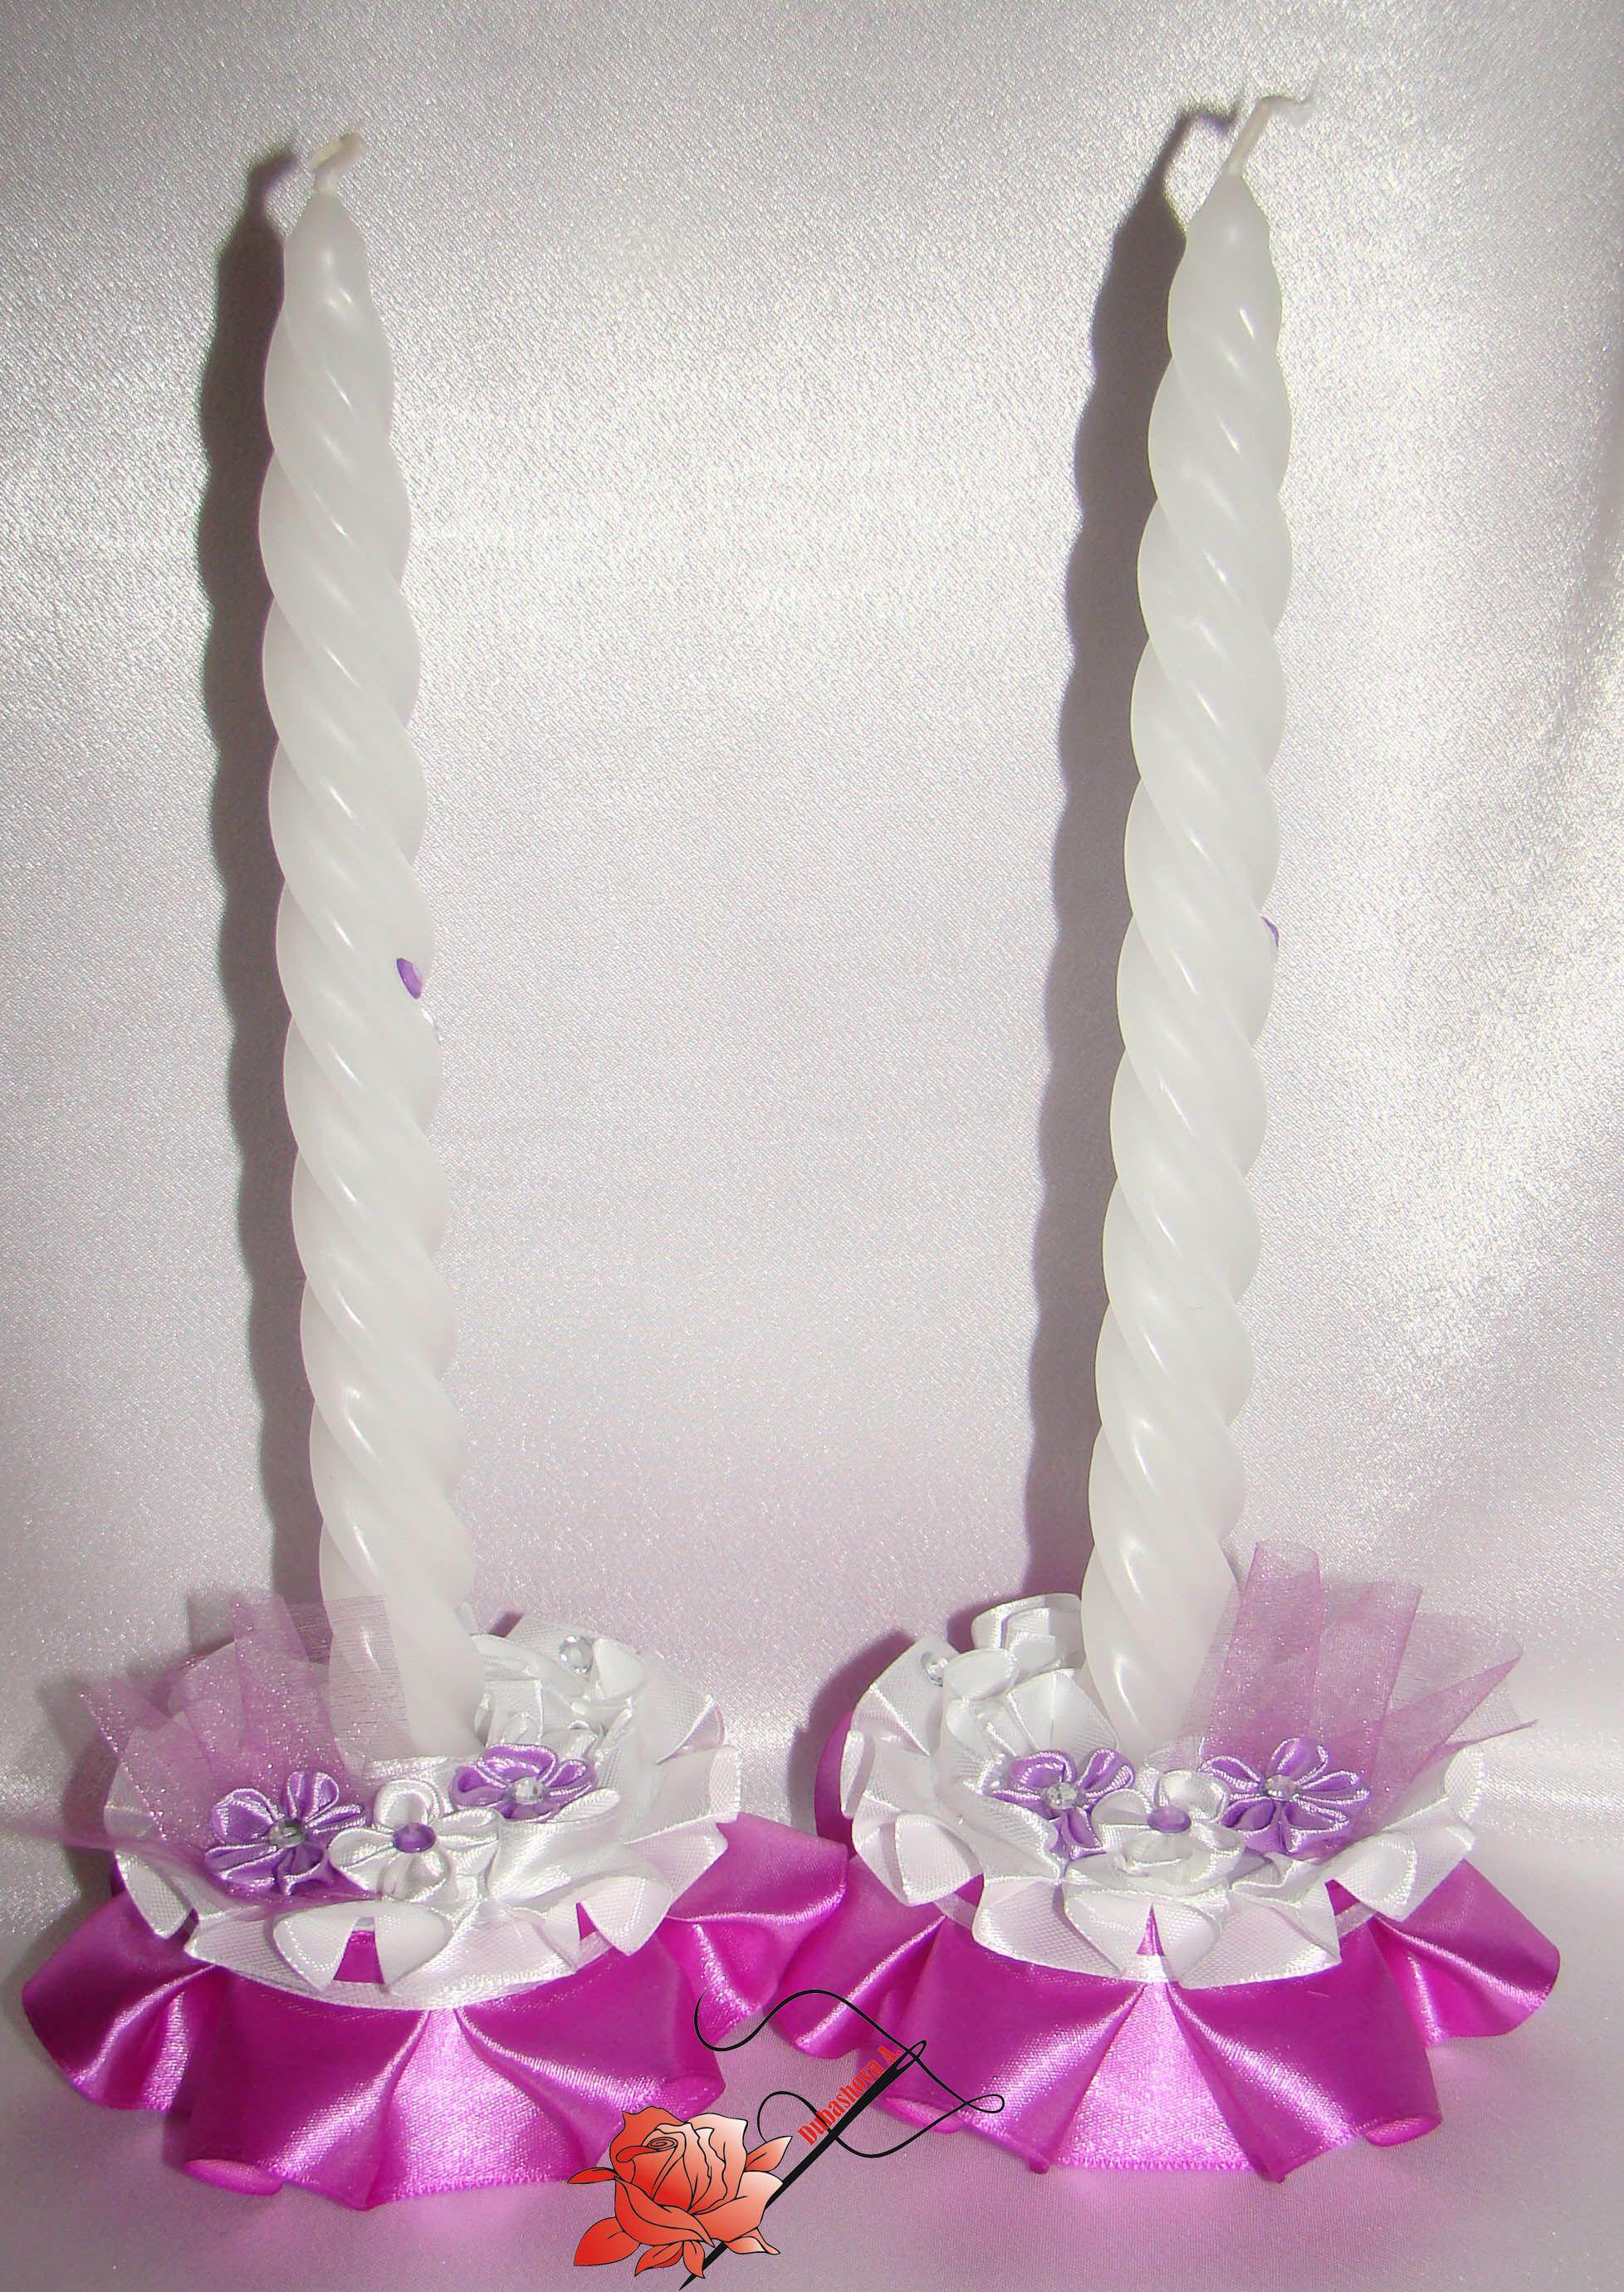 handmade wedding decorationforglasses clothingforchampagne garter parentalcandles familyhearth